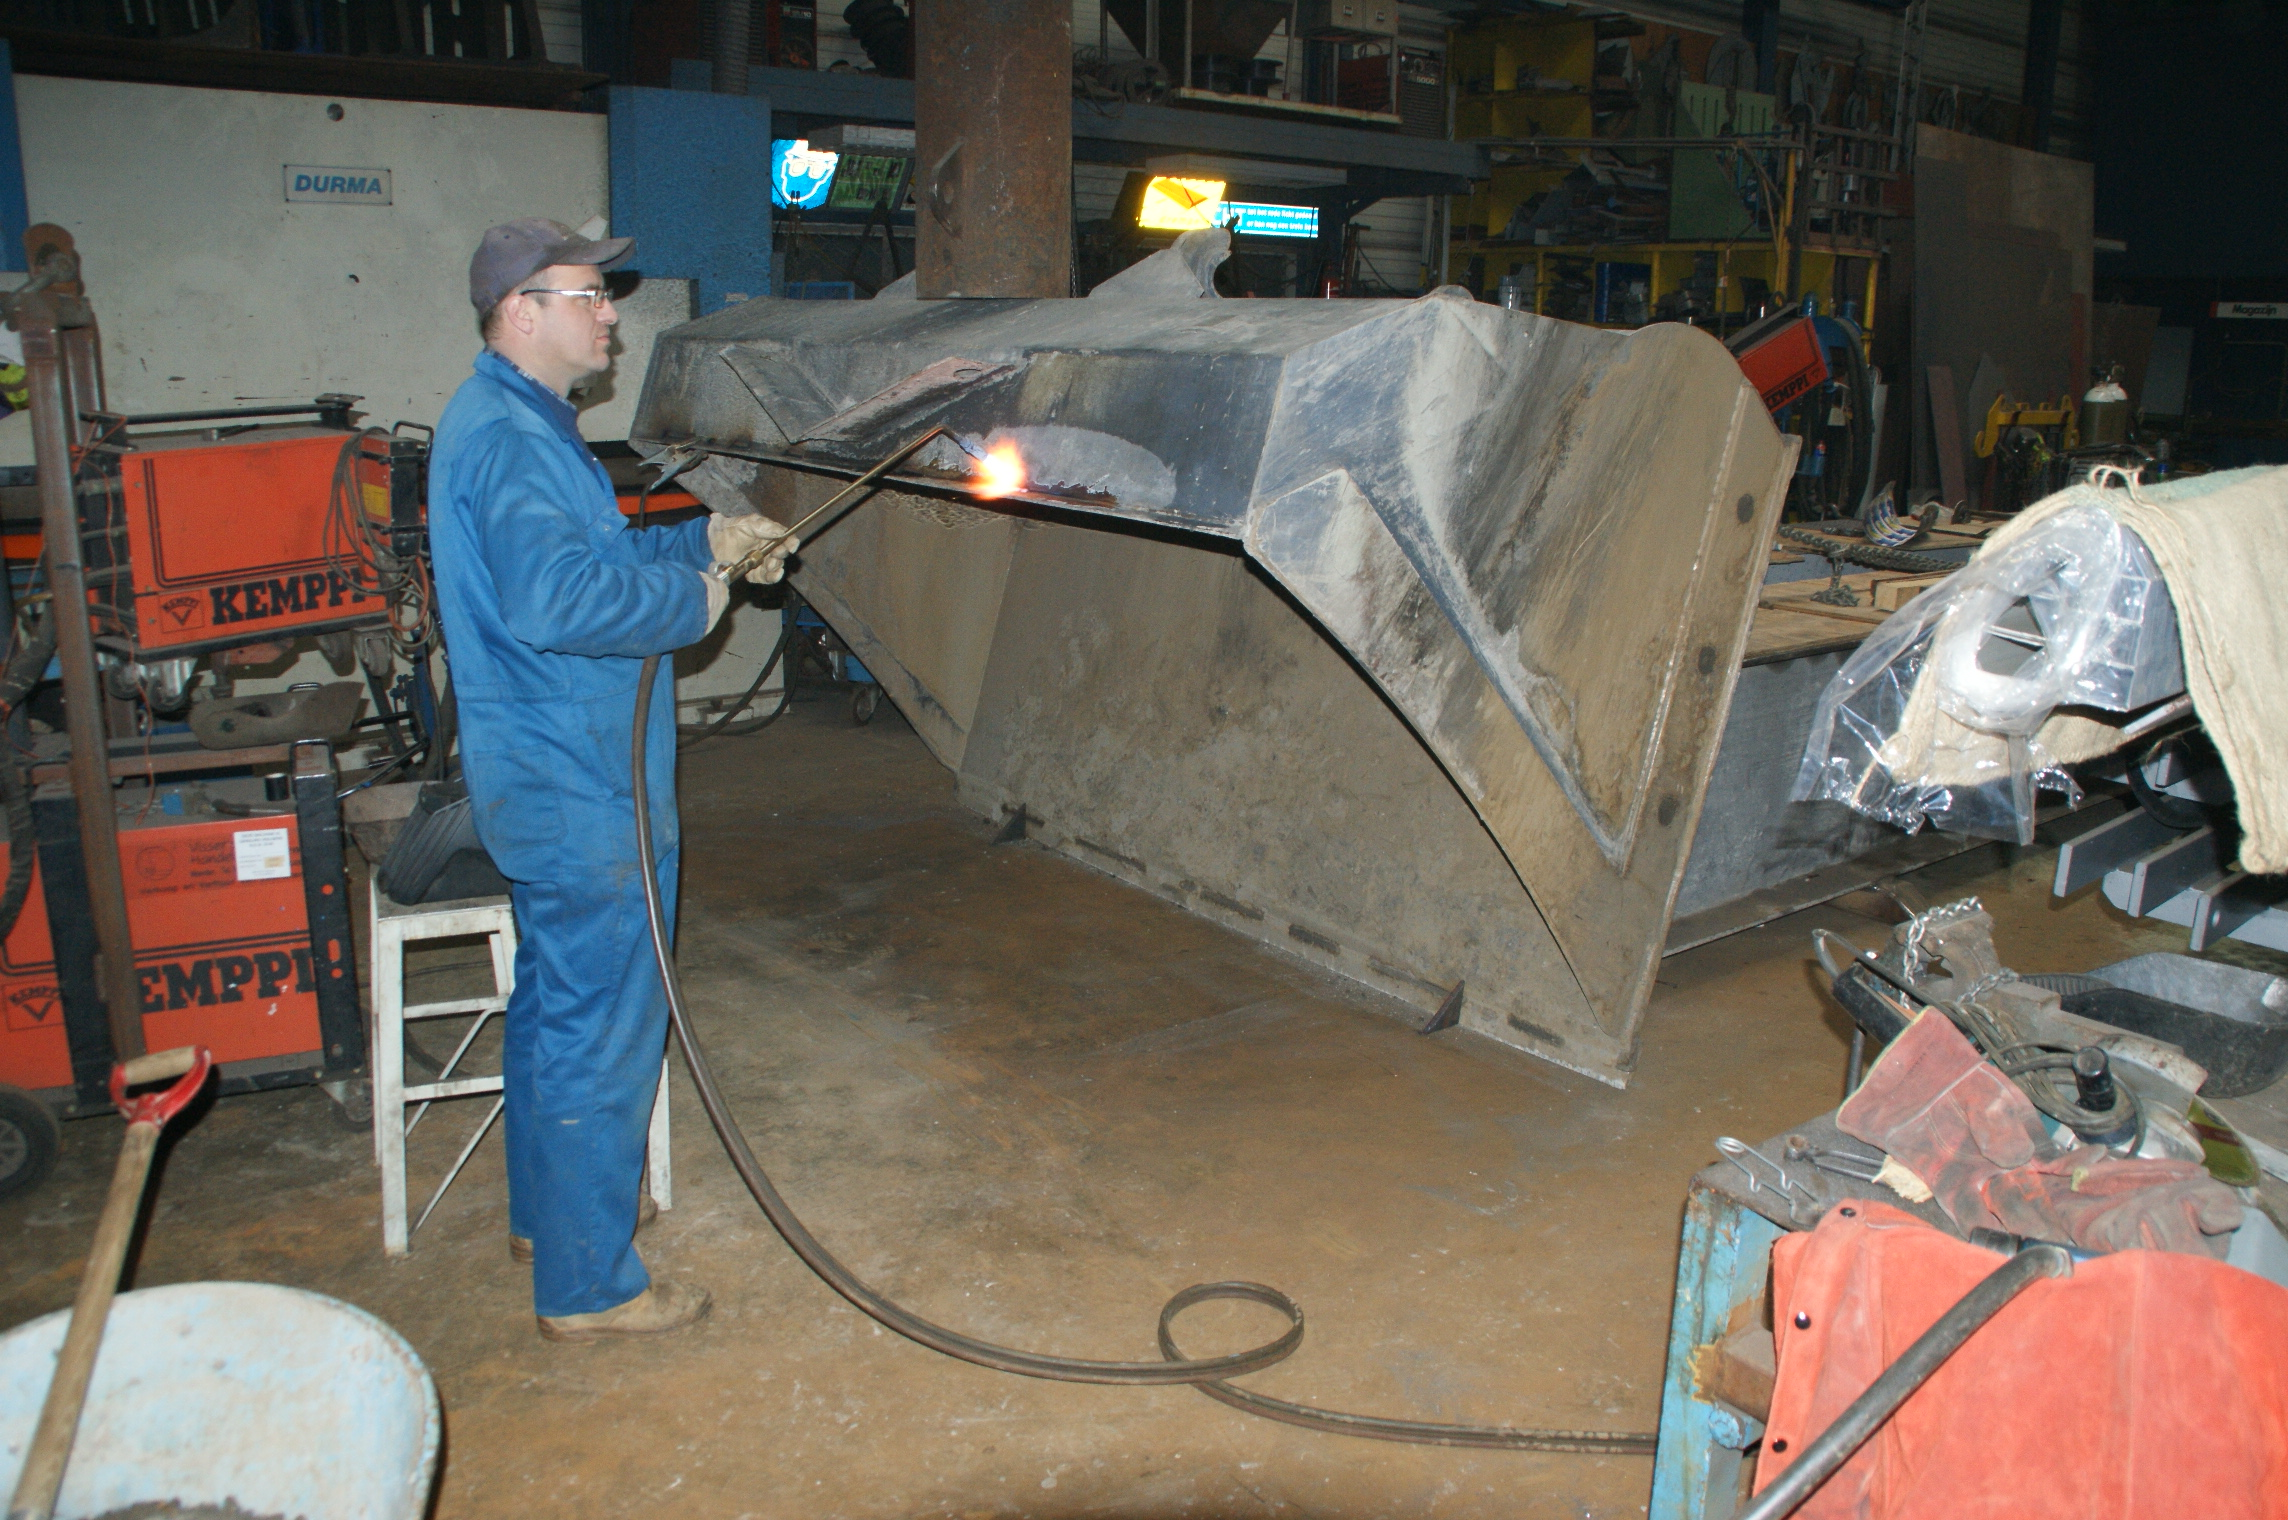 Reparatie shovelbak